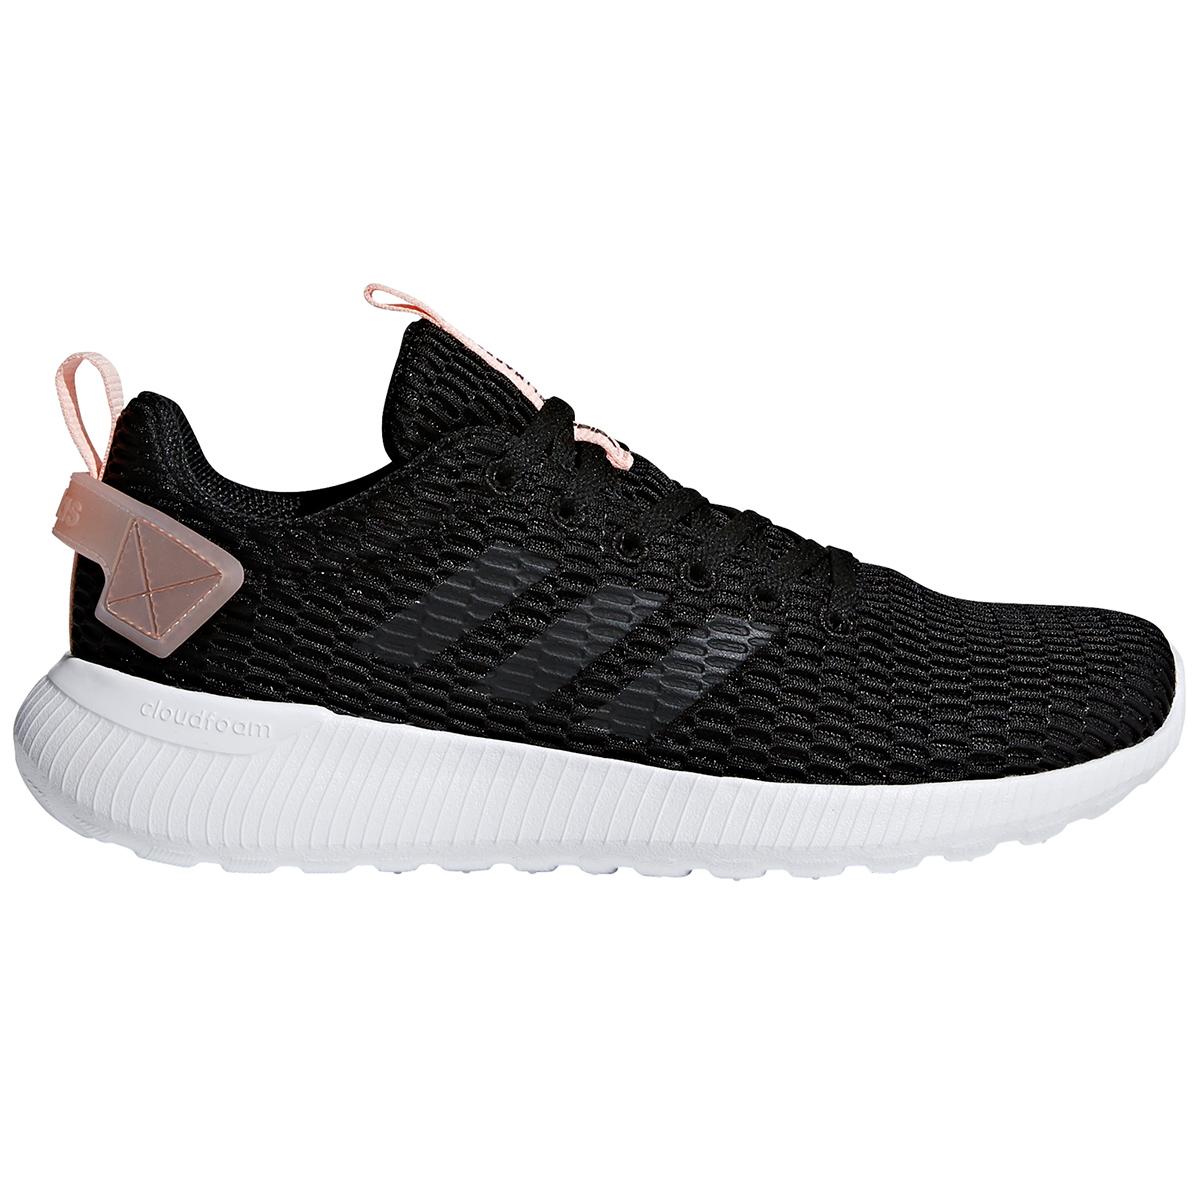 Adidas Women's Cloudfoam Lite Racer Cc Running Shoes - Black, 10